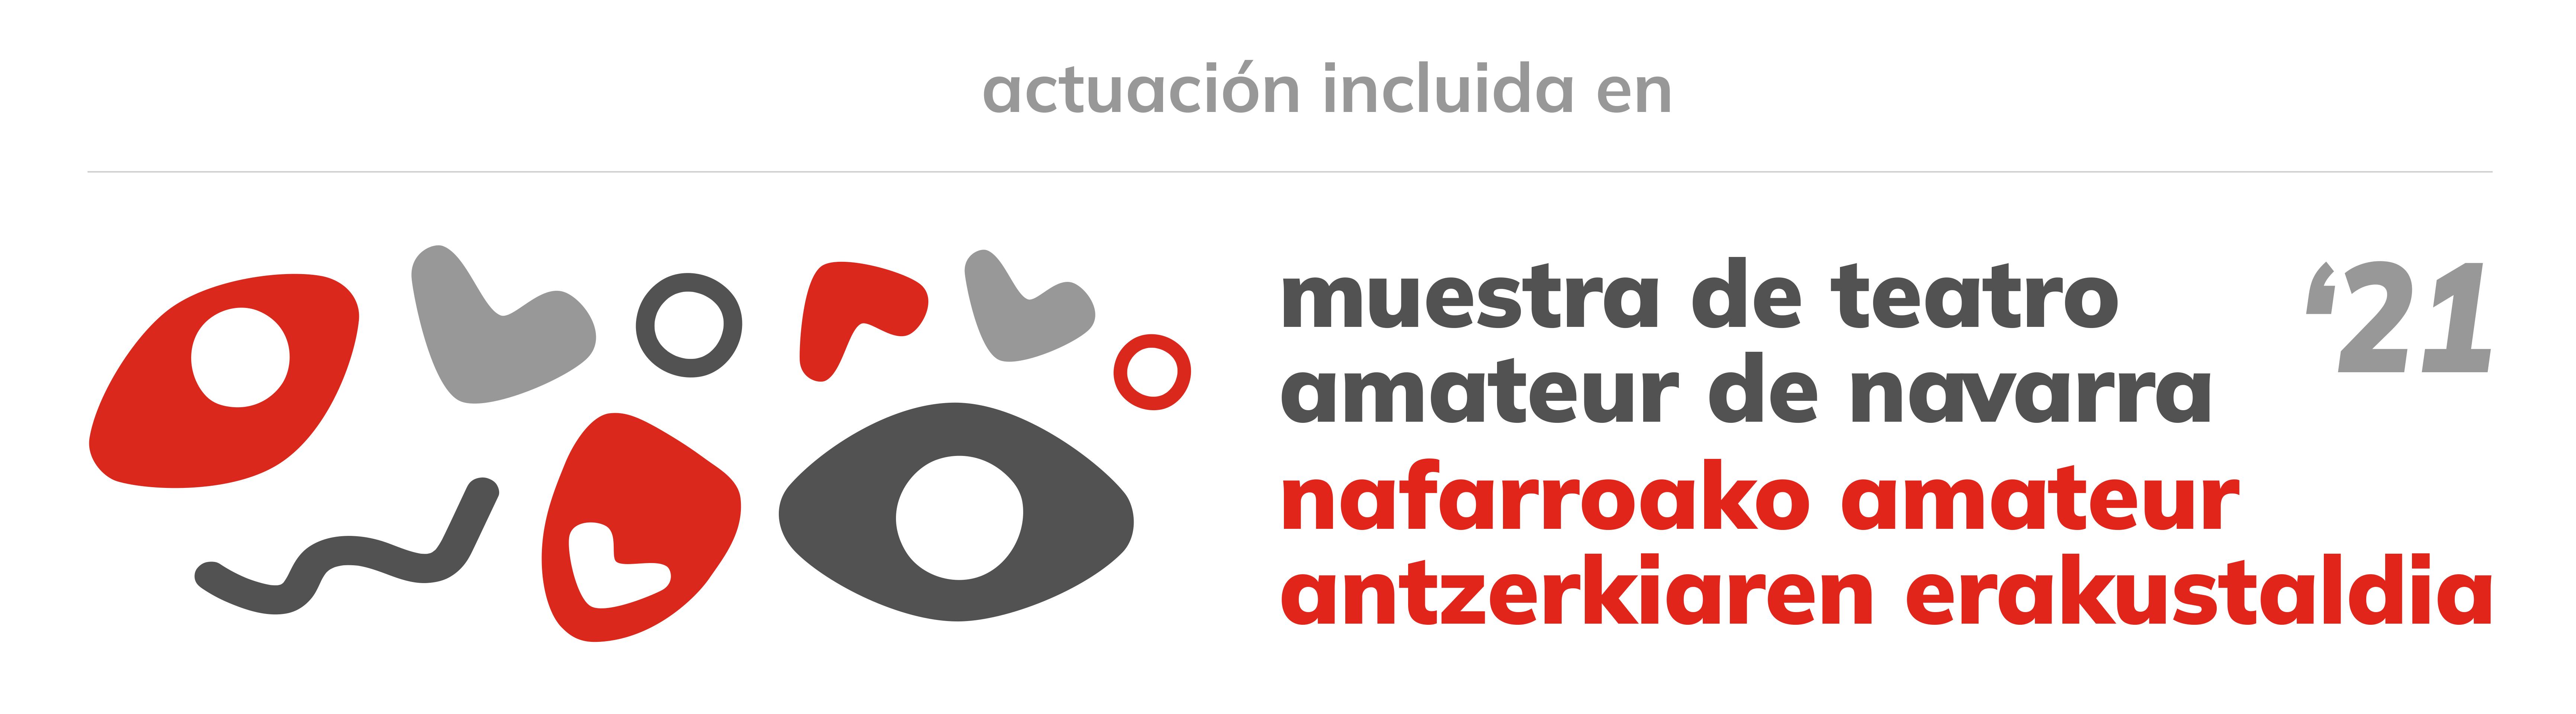 Muestra de Teatro Amateur de Navarra 2021